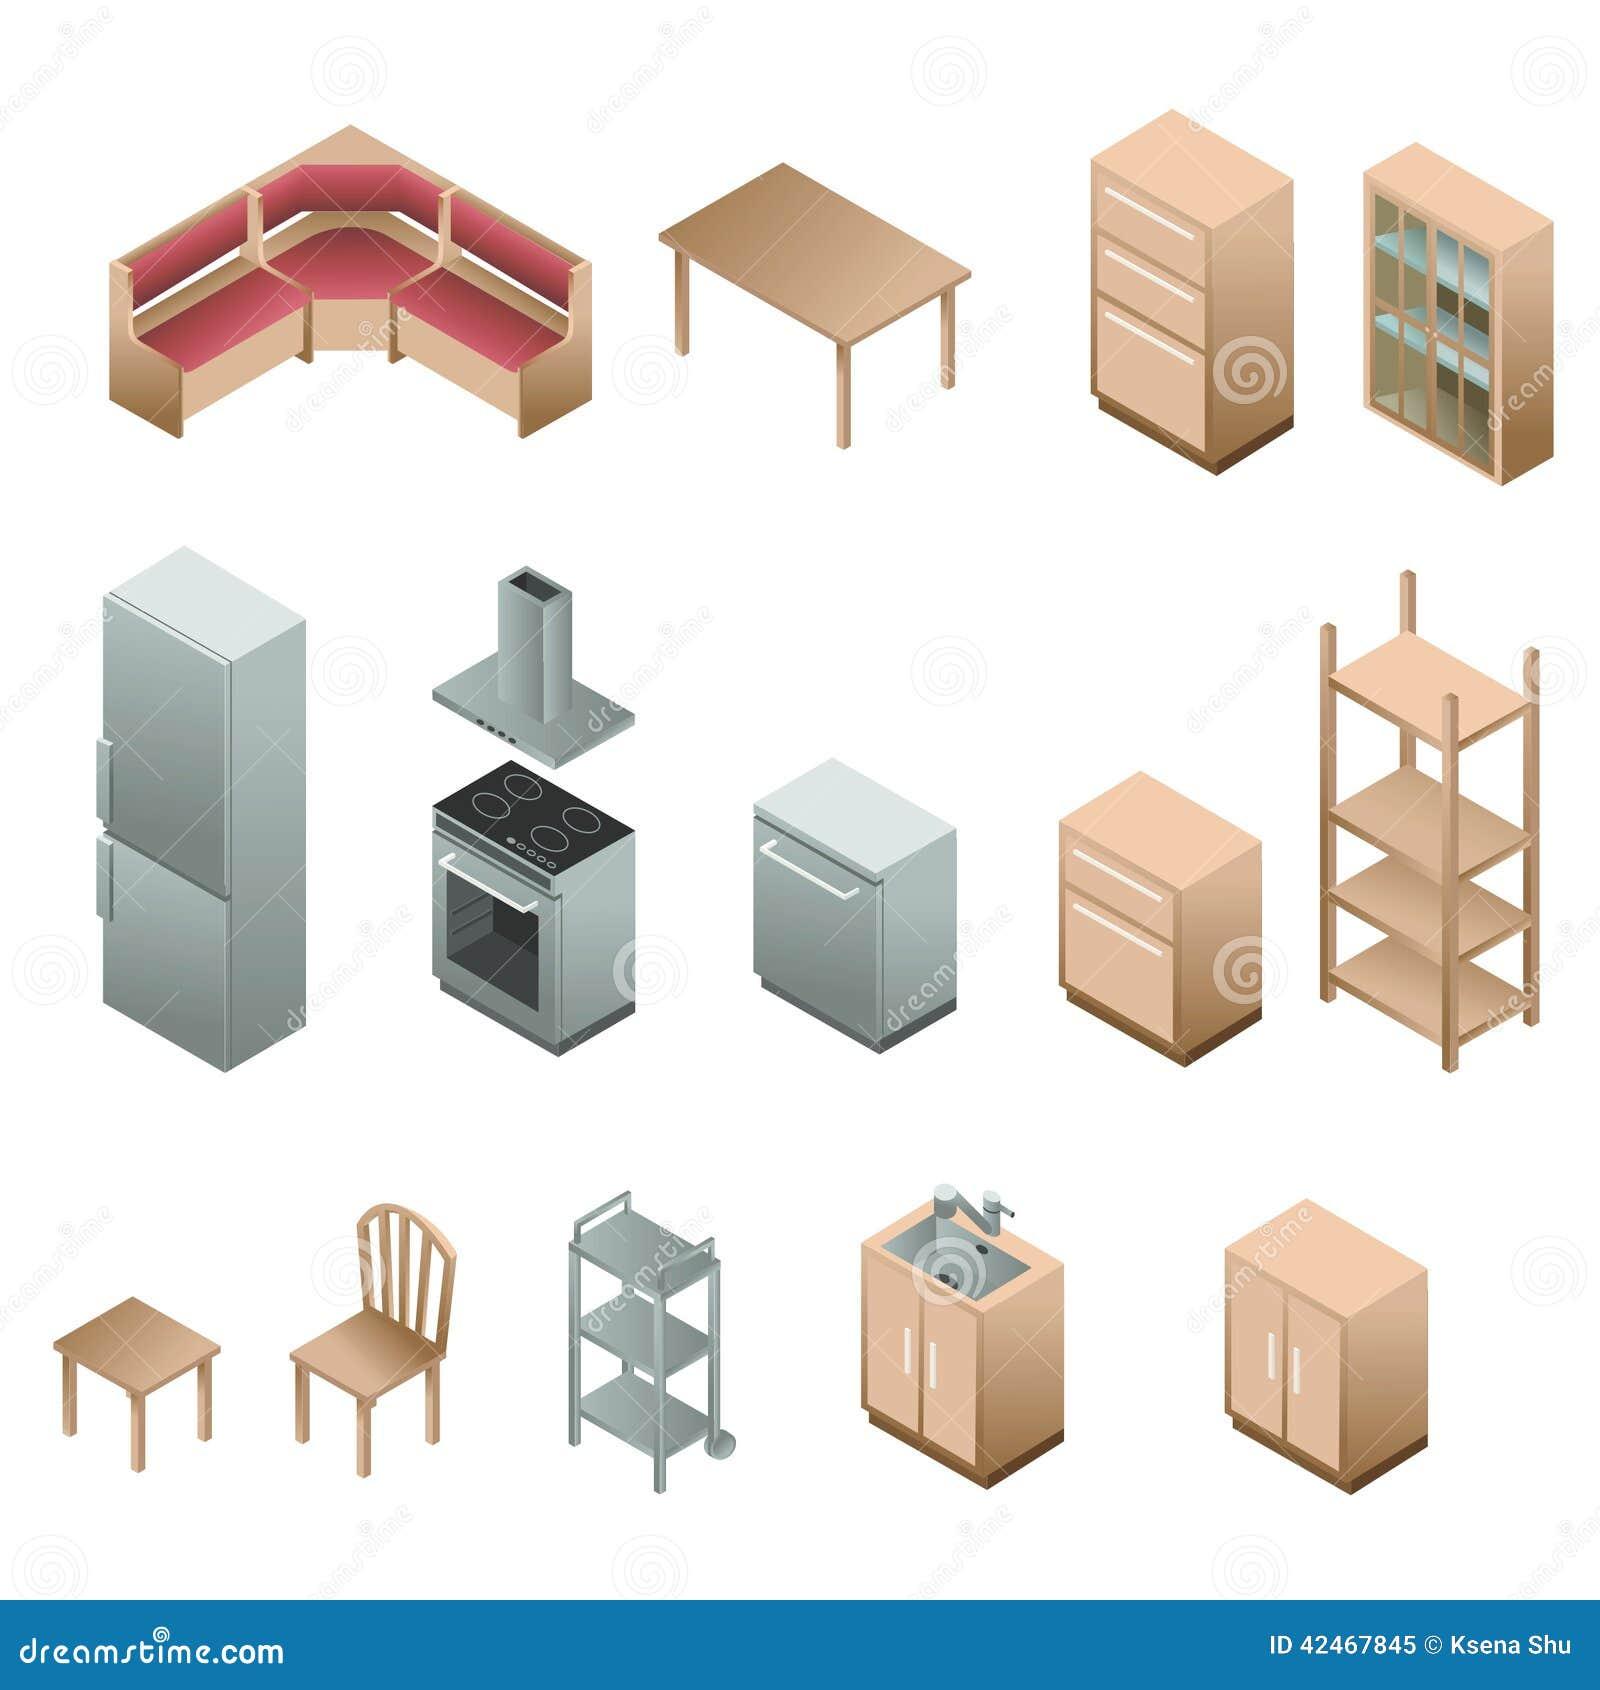 Isometric wooden furniture for kitchen stock vector for Programa para cocinas 3d gratis